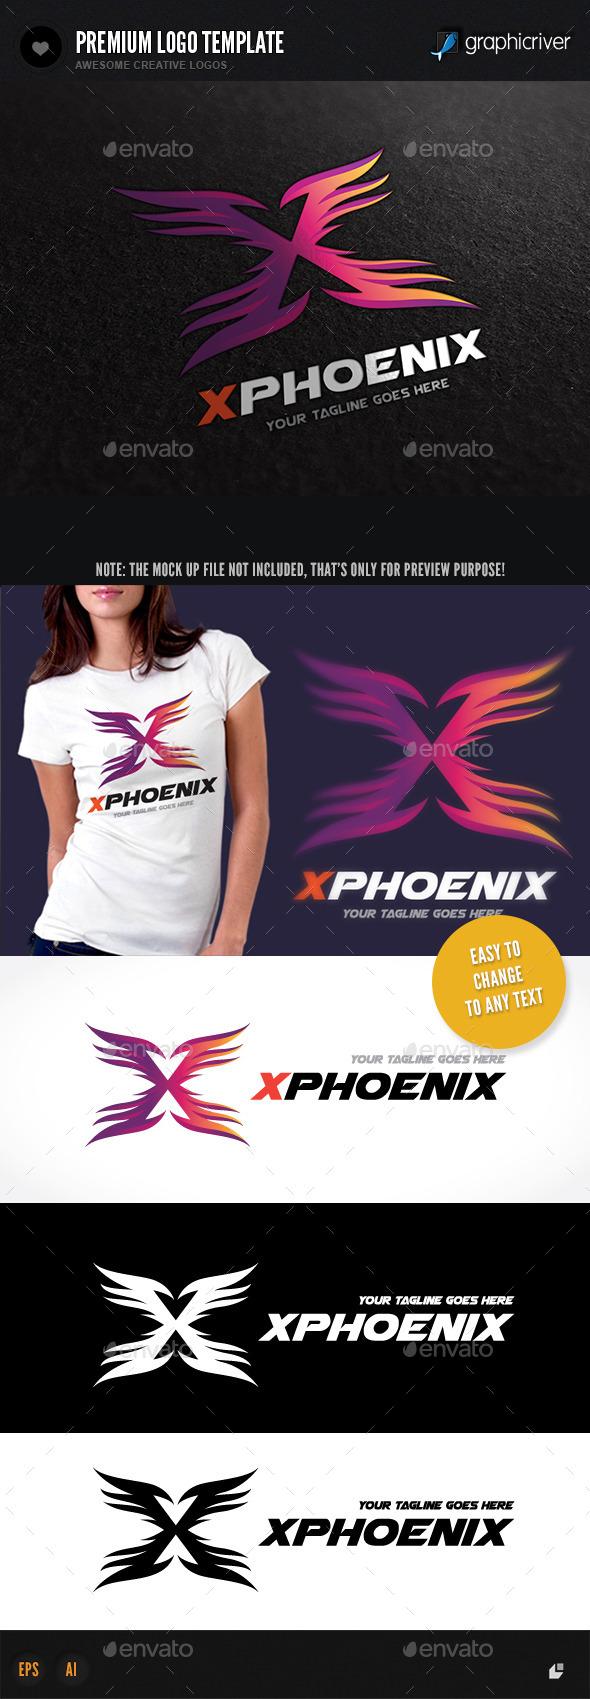 X Phoenix